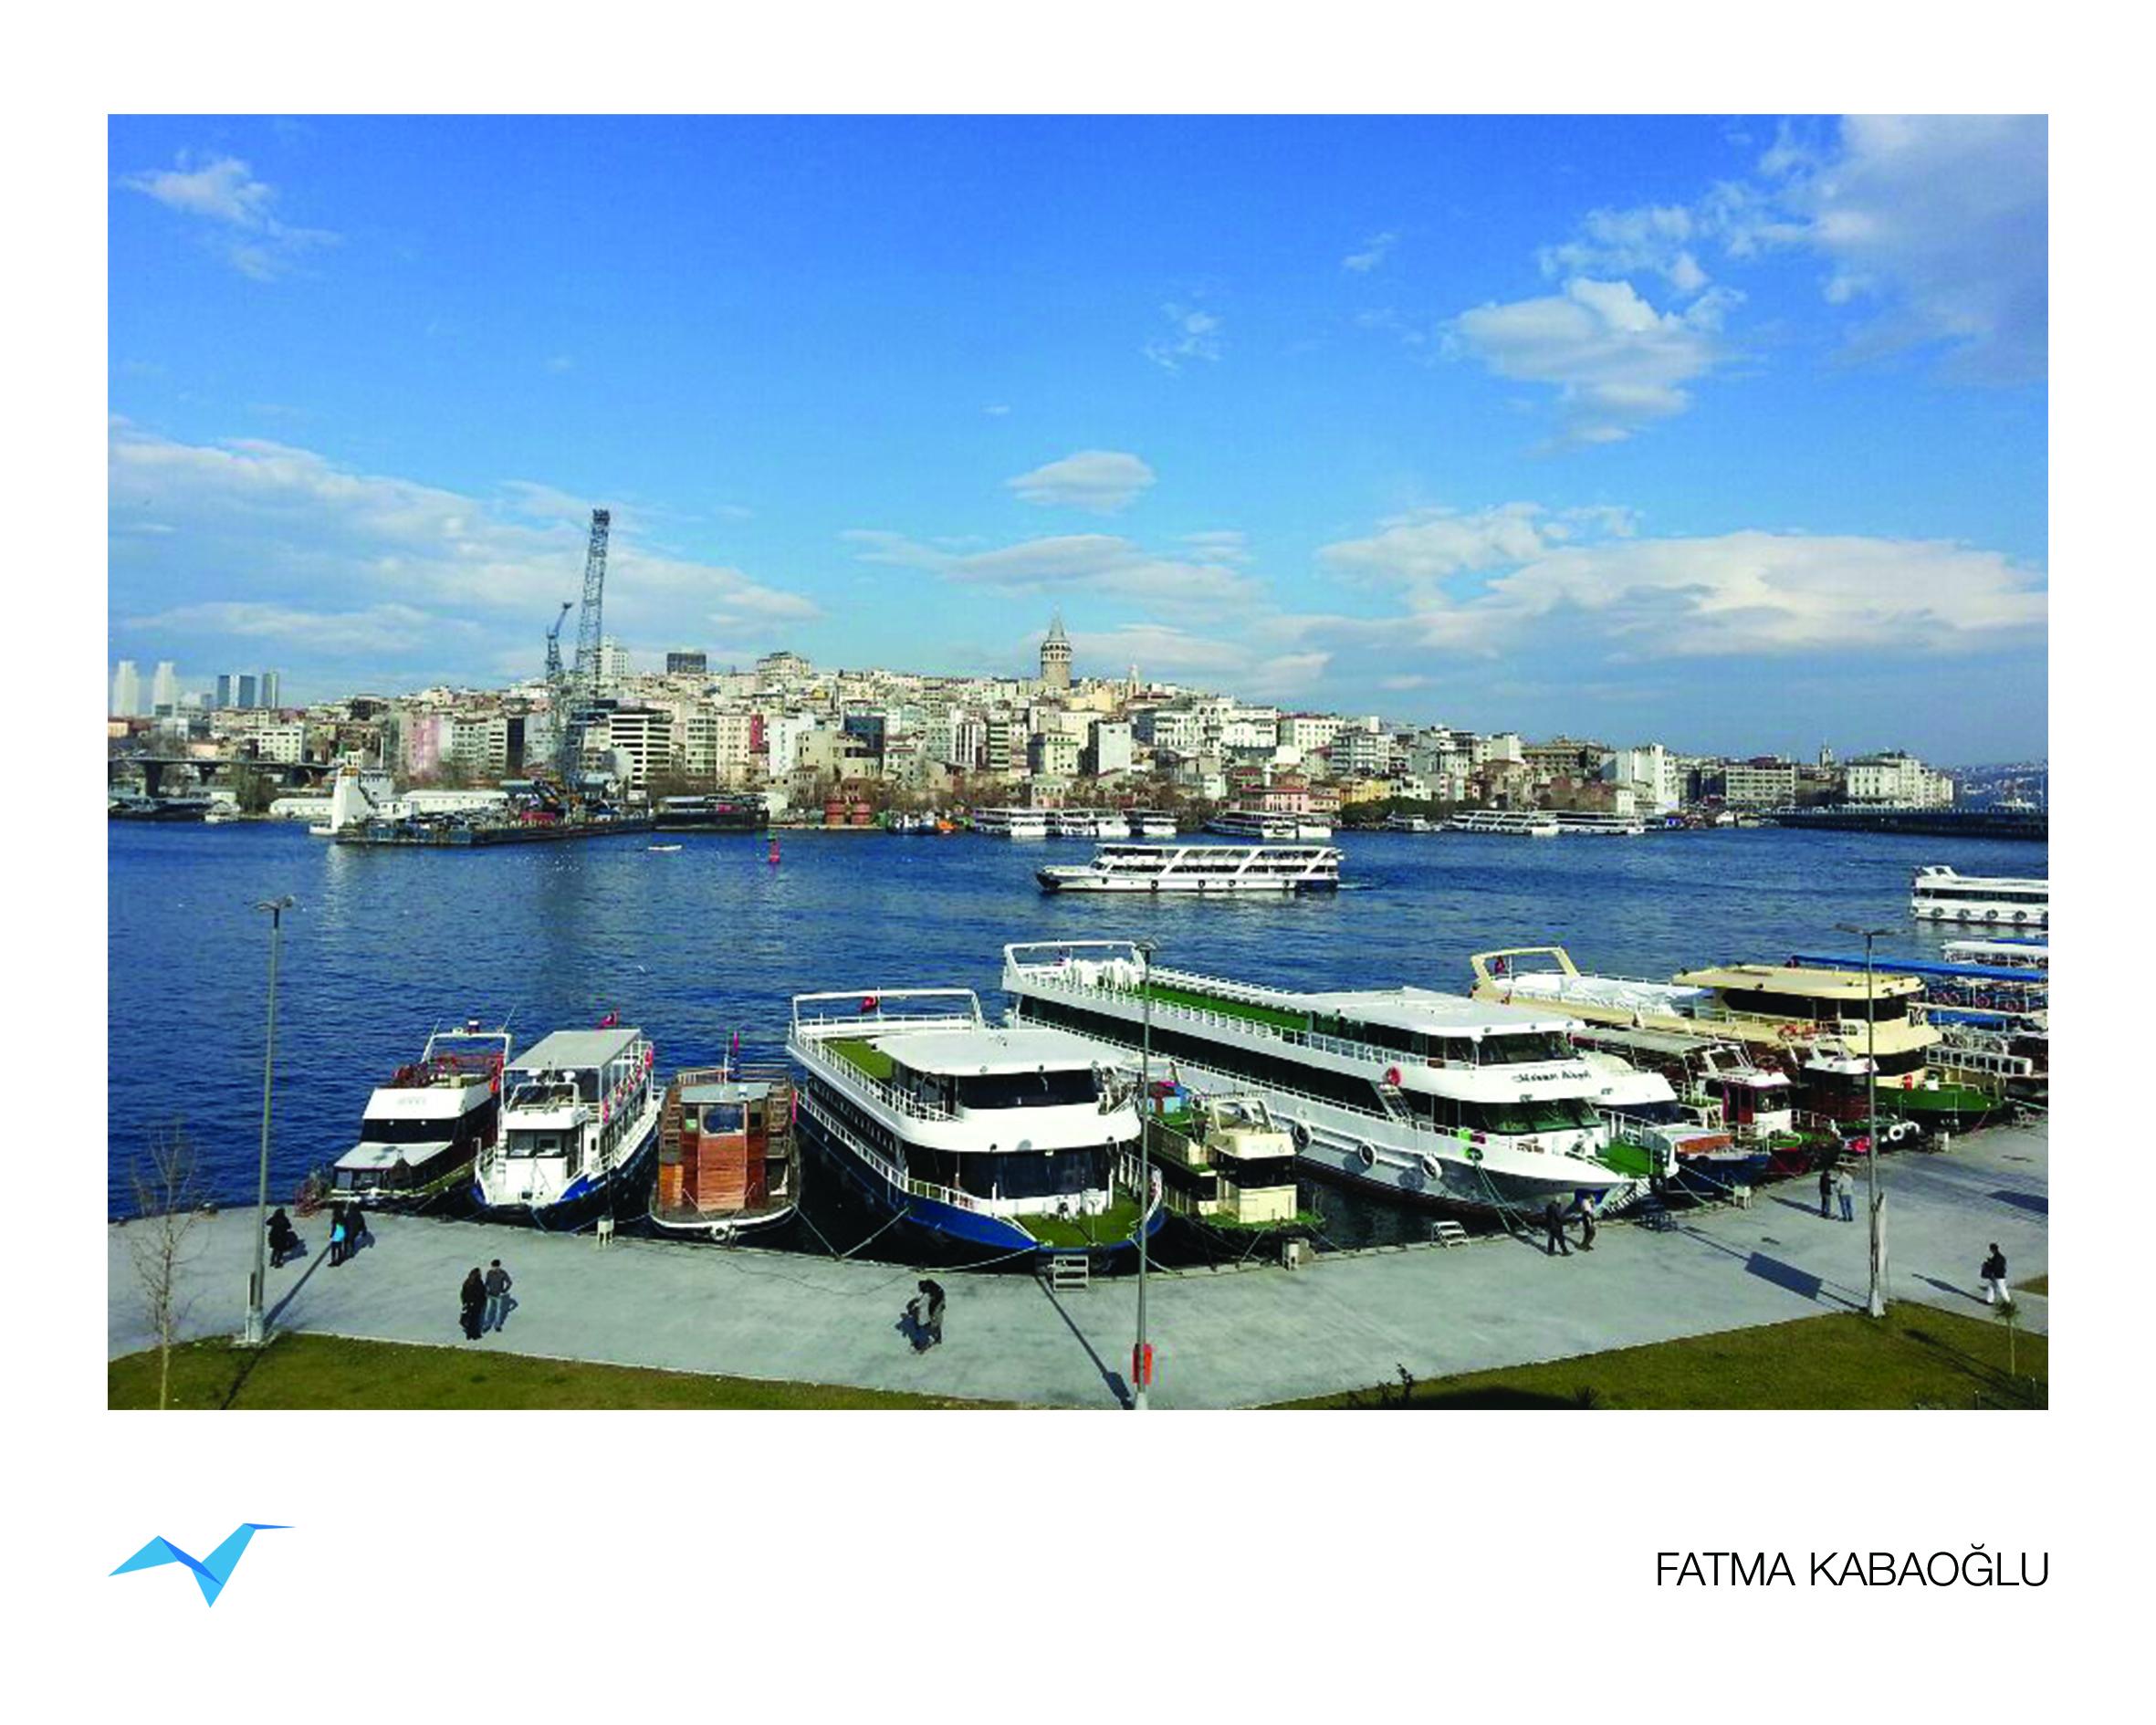 Fatma_Kabaoglu_5